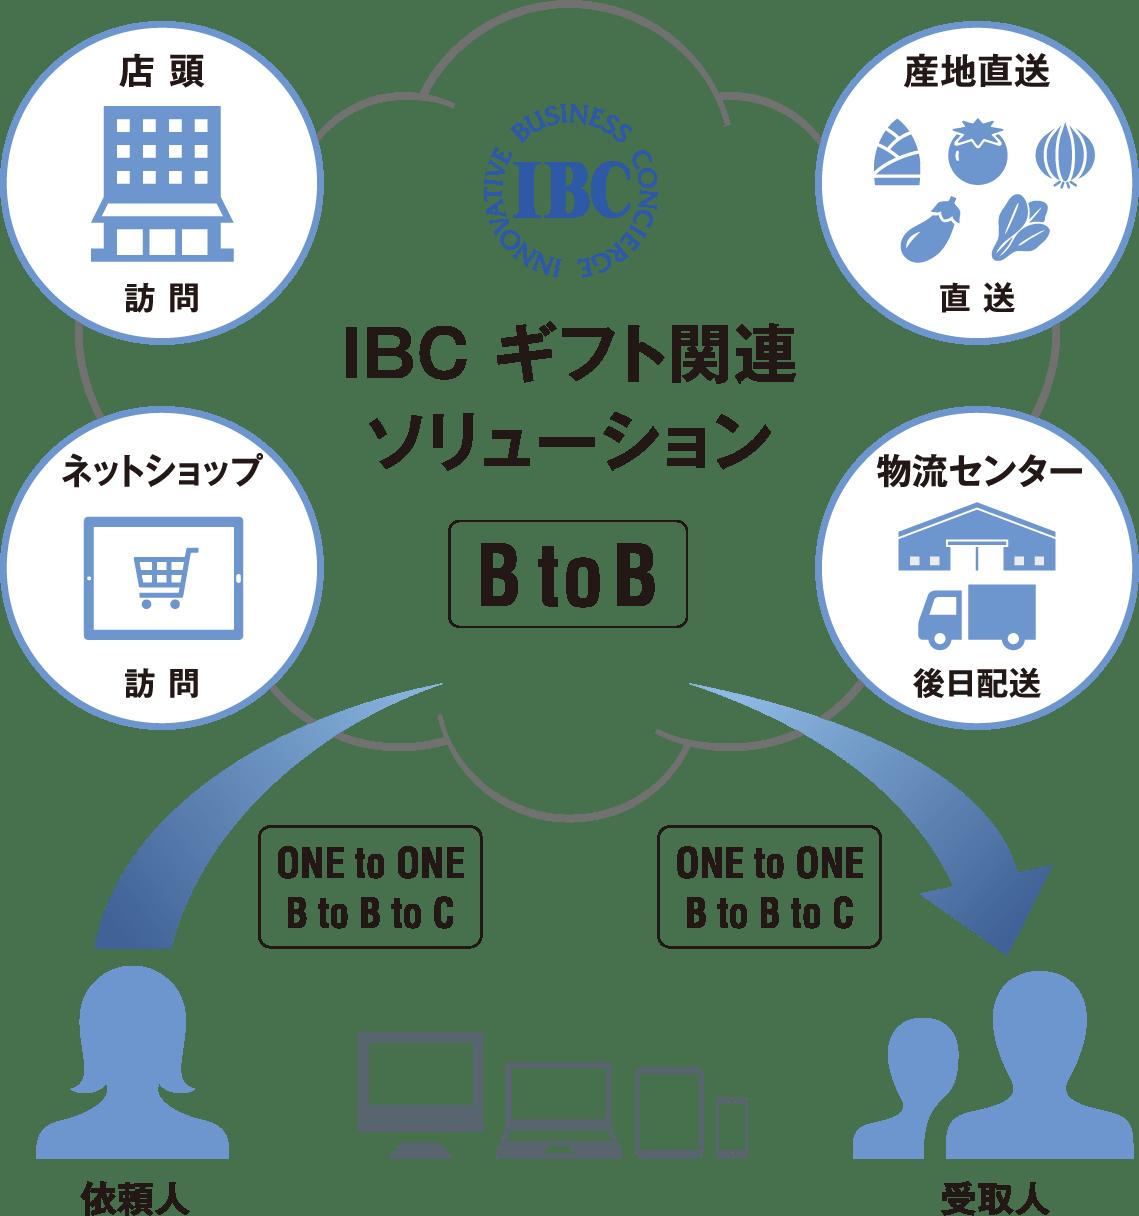 IBC ギフト関連ソリューション